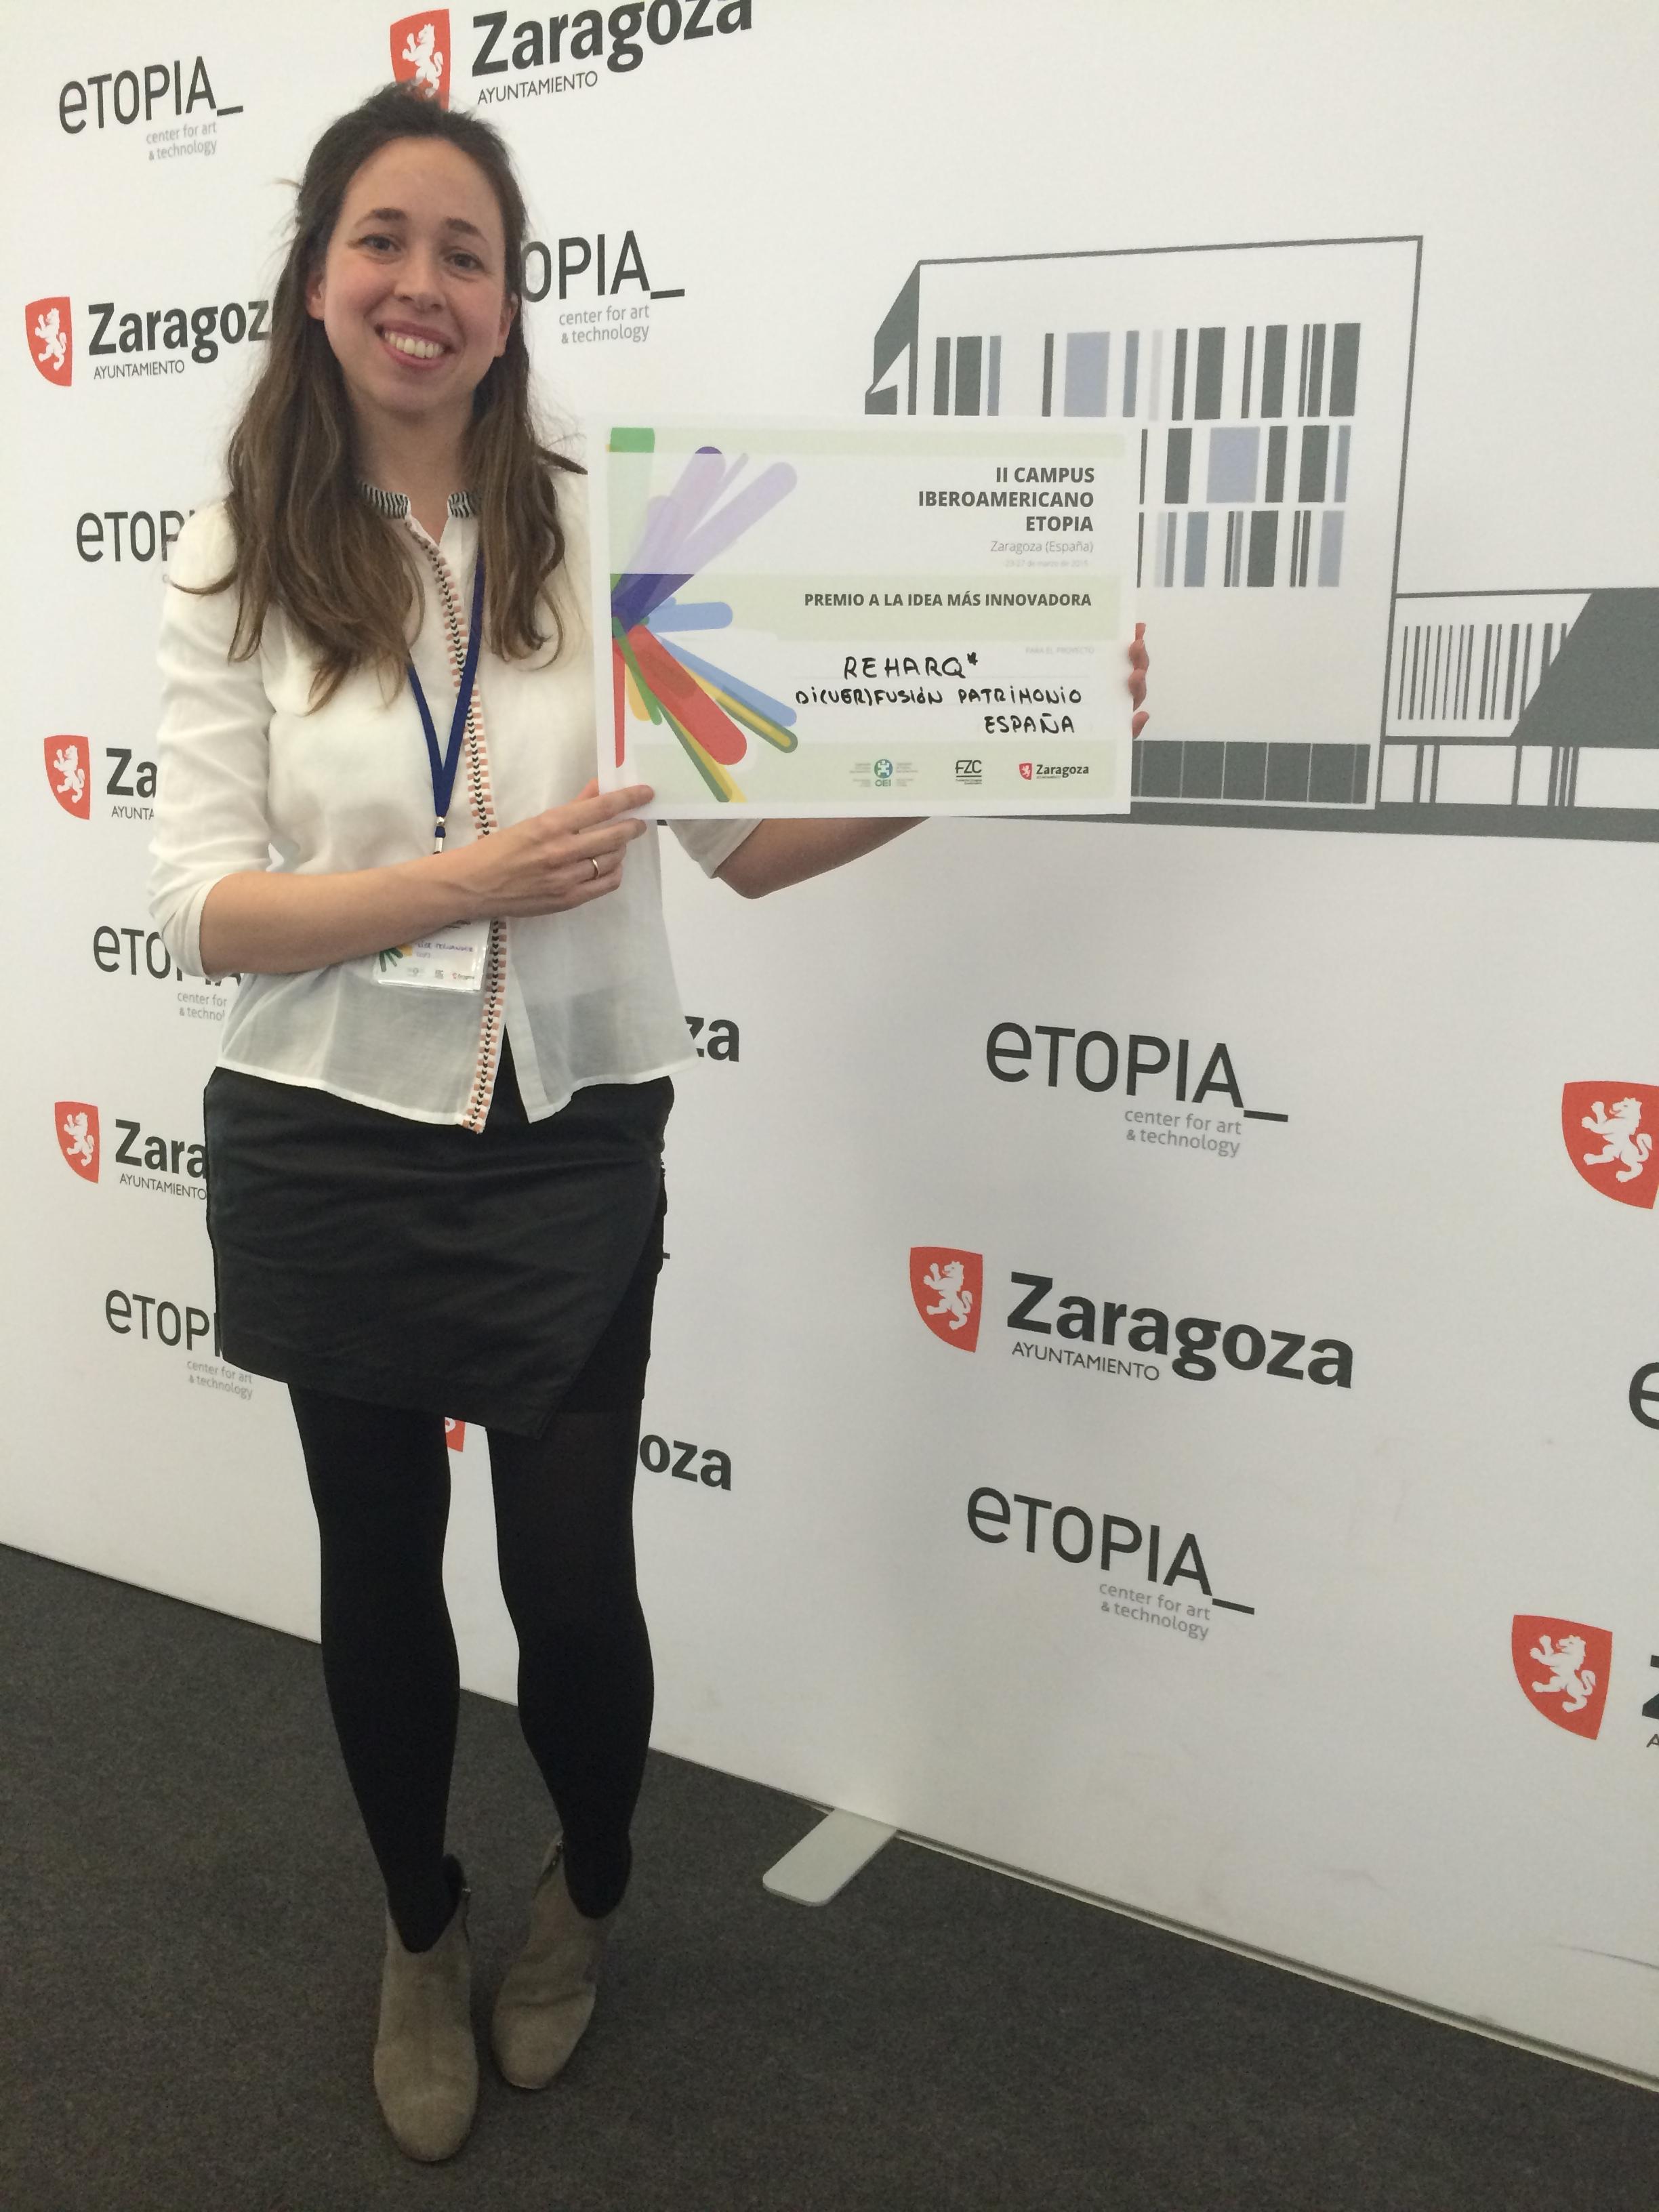 premio idea innovadora_organizacion estados iberoamericanos_campus etopia_reharq